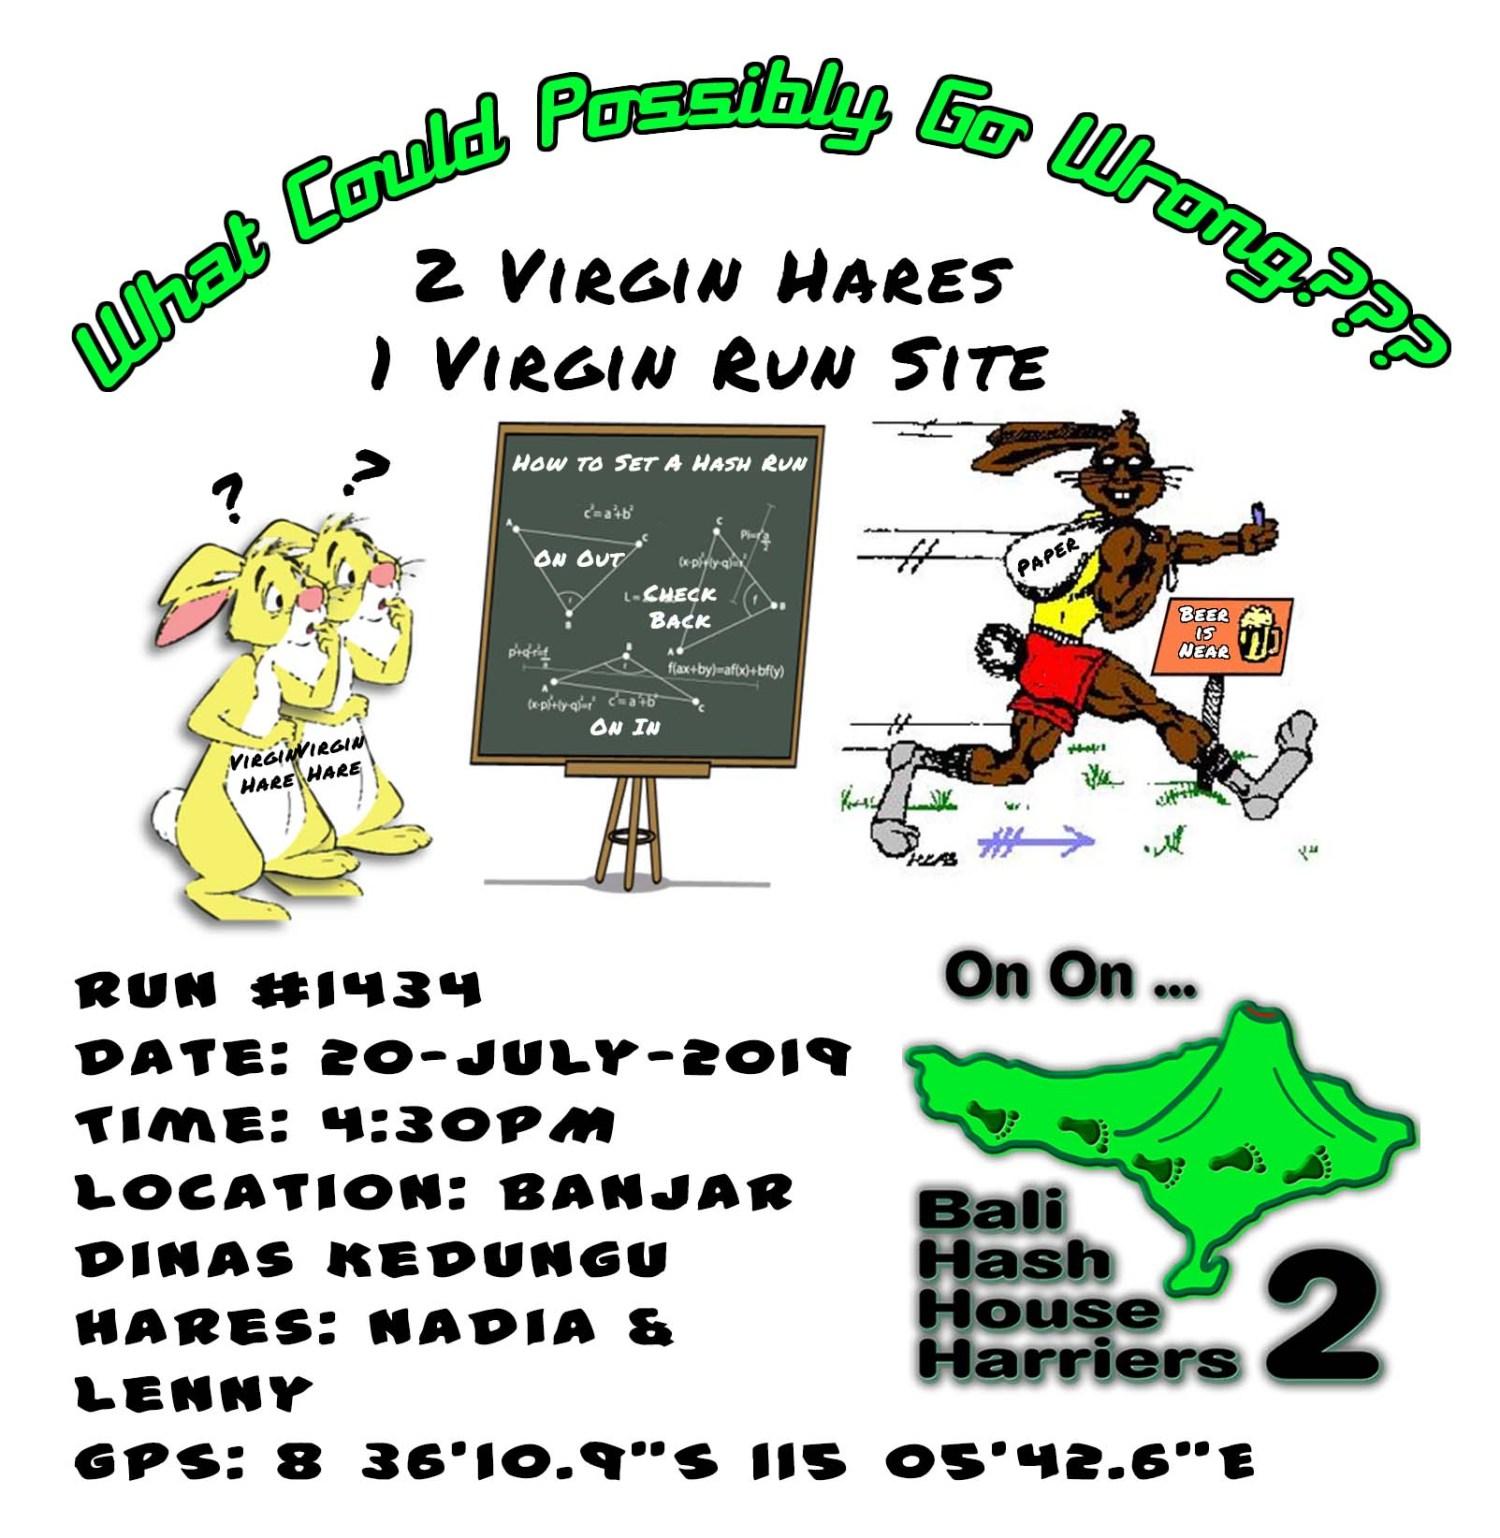 Virgin Hare Virgin Runsite Bali Hash House Harriers 2